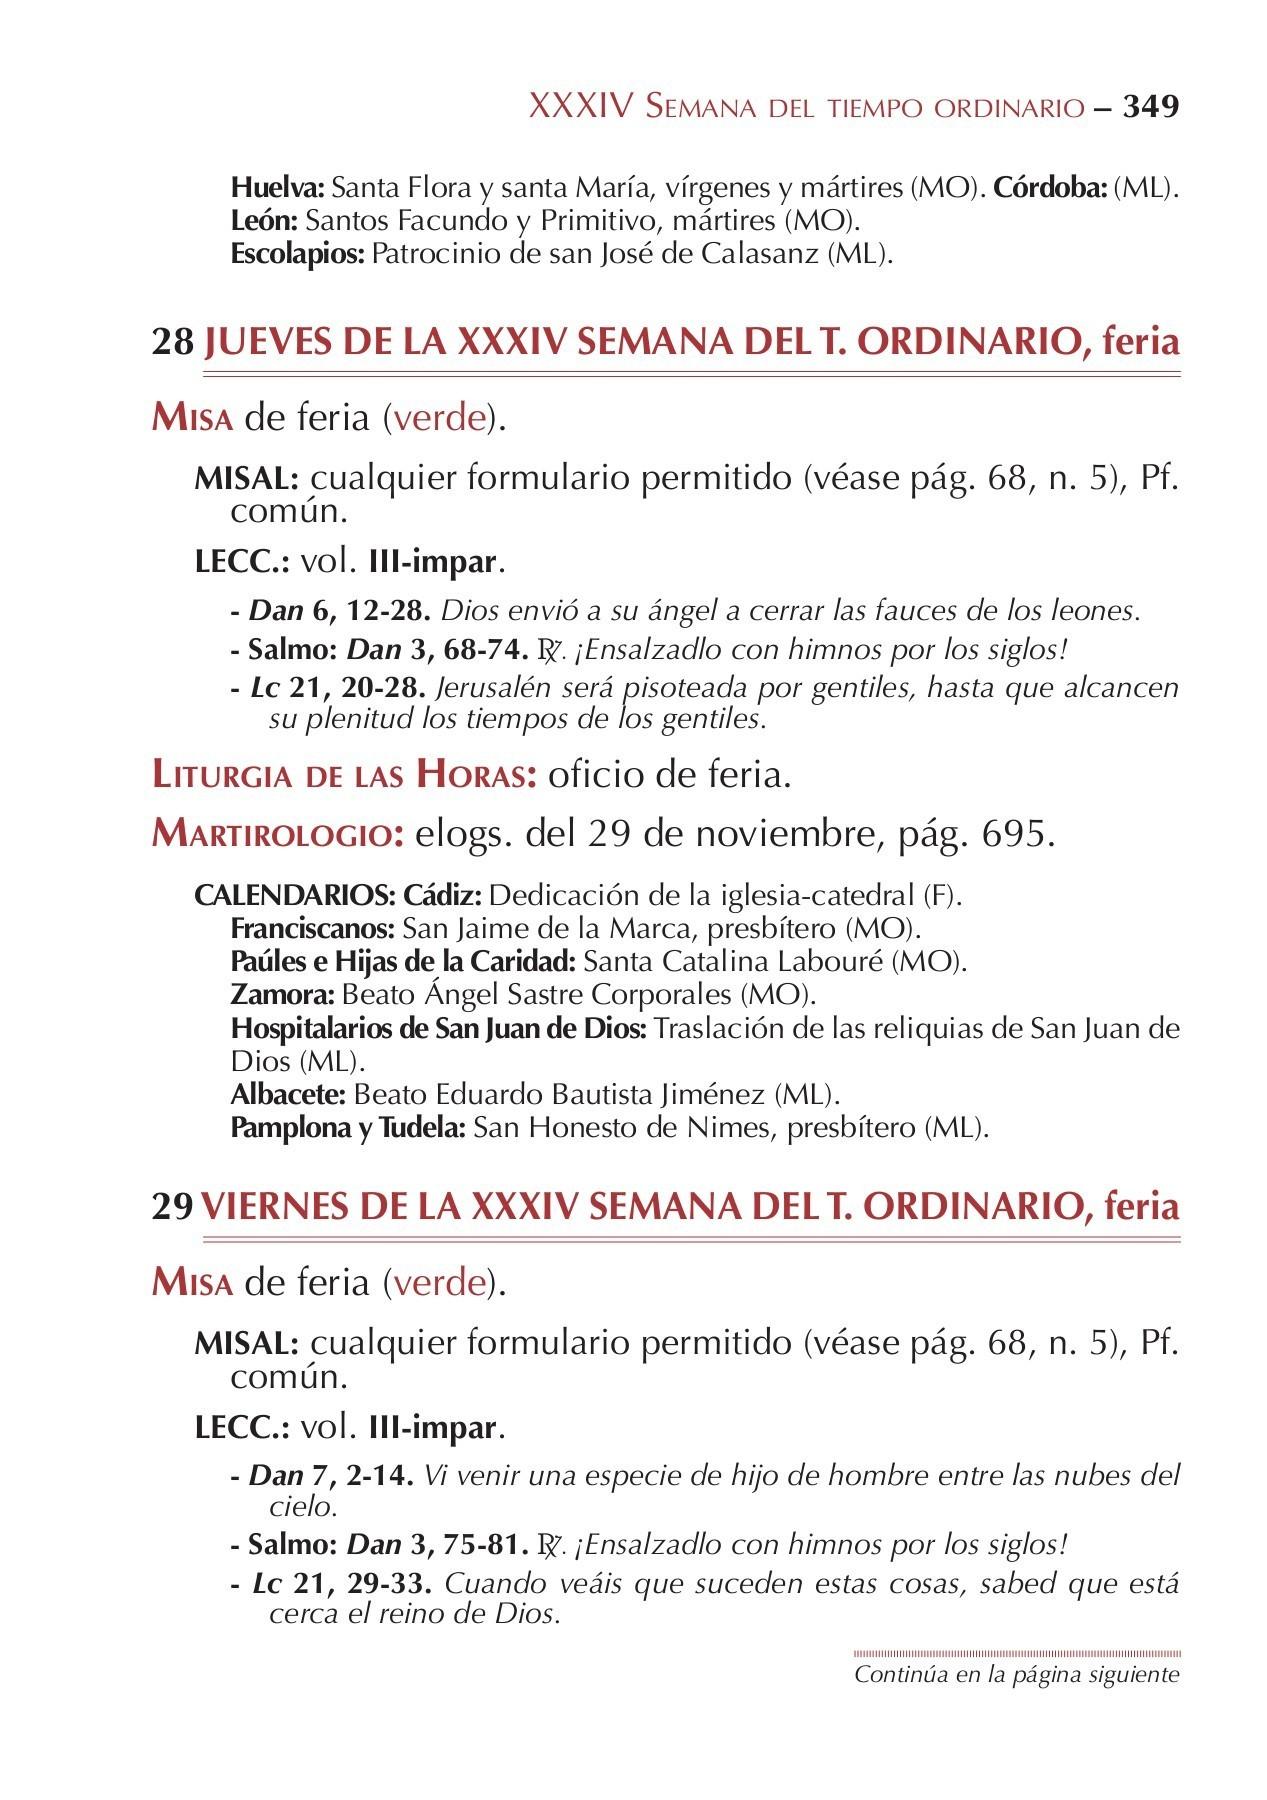 Calendario Festivos 2020 Zaragoza Actual Calendario Litšrgico Pastoral 2018 2019 Pages 351 386 Of Calendario Festivos 2020 Zaragoza Más Populares Unizar H